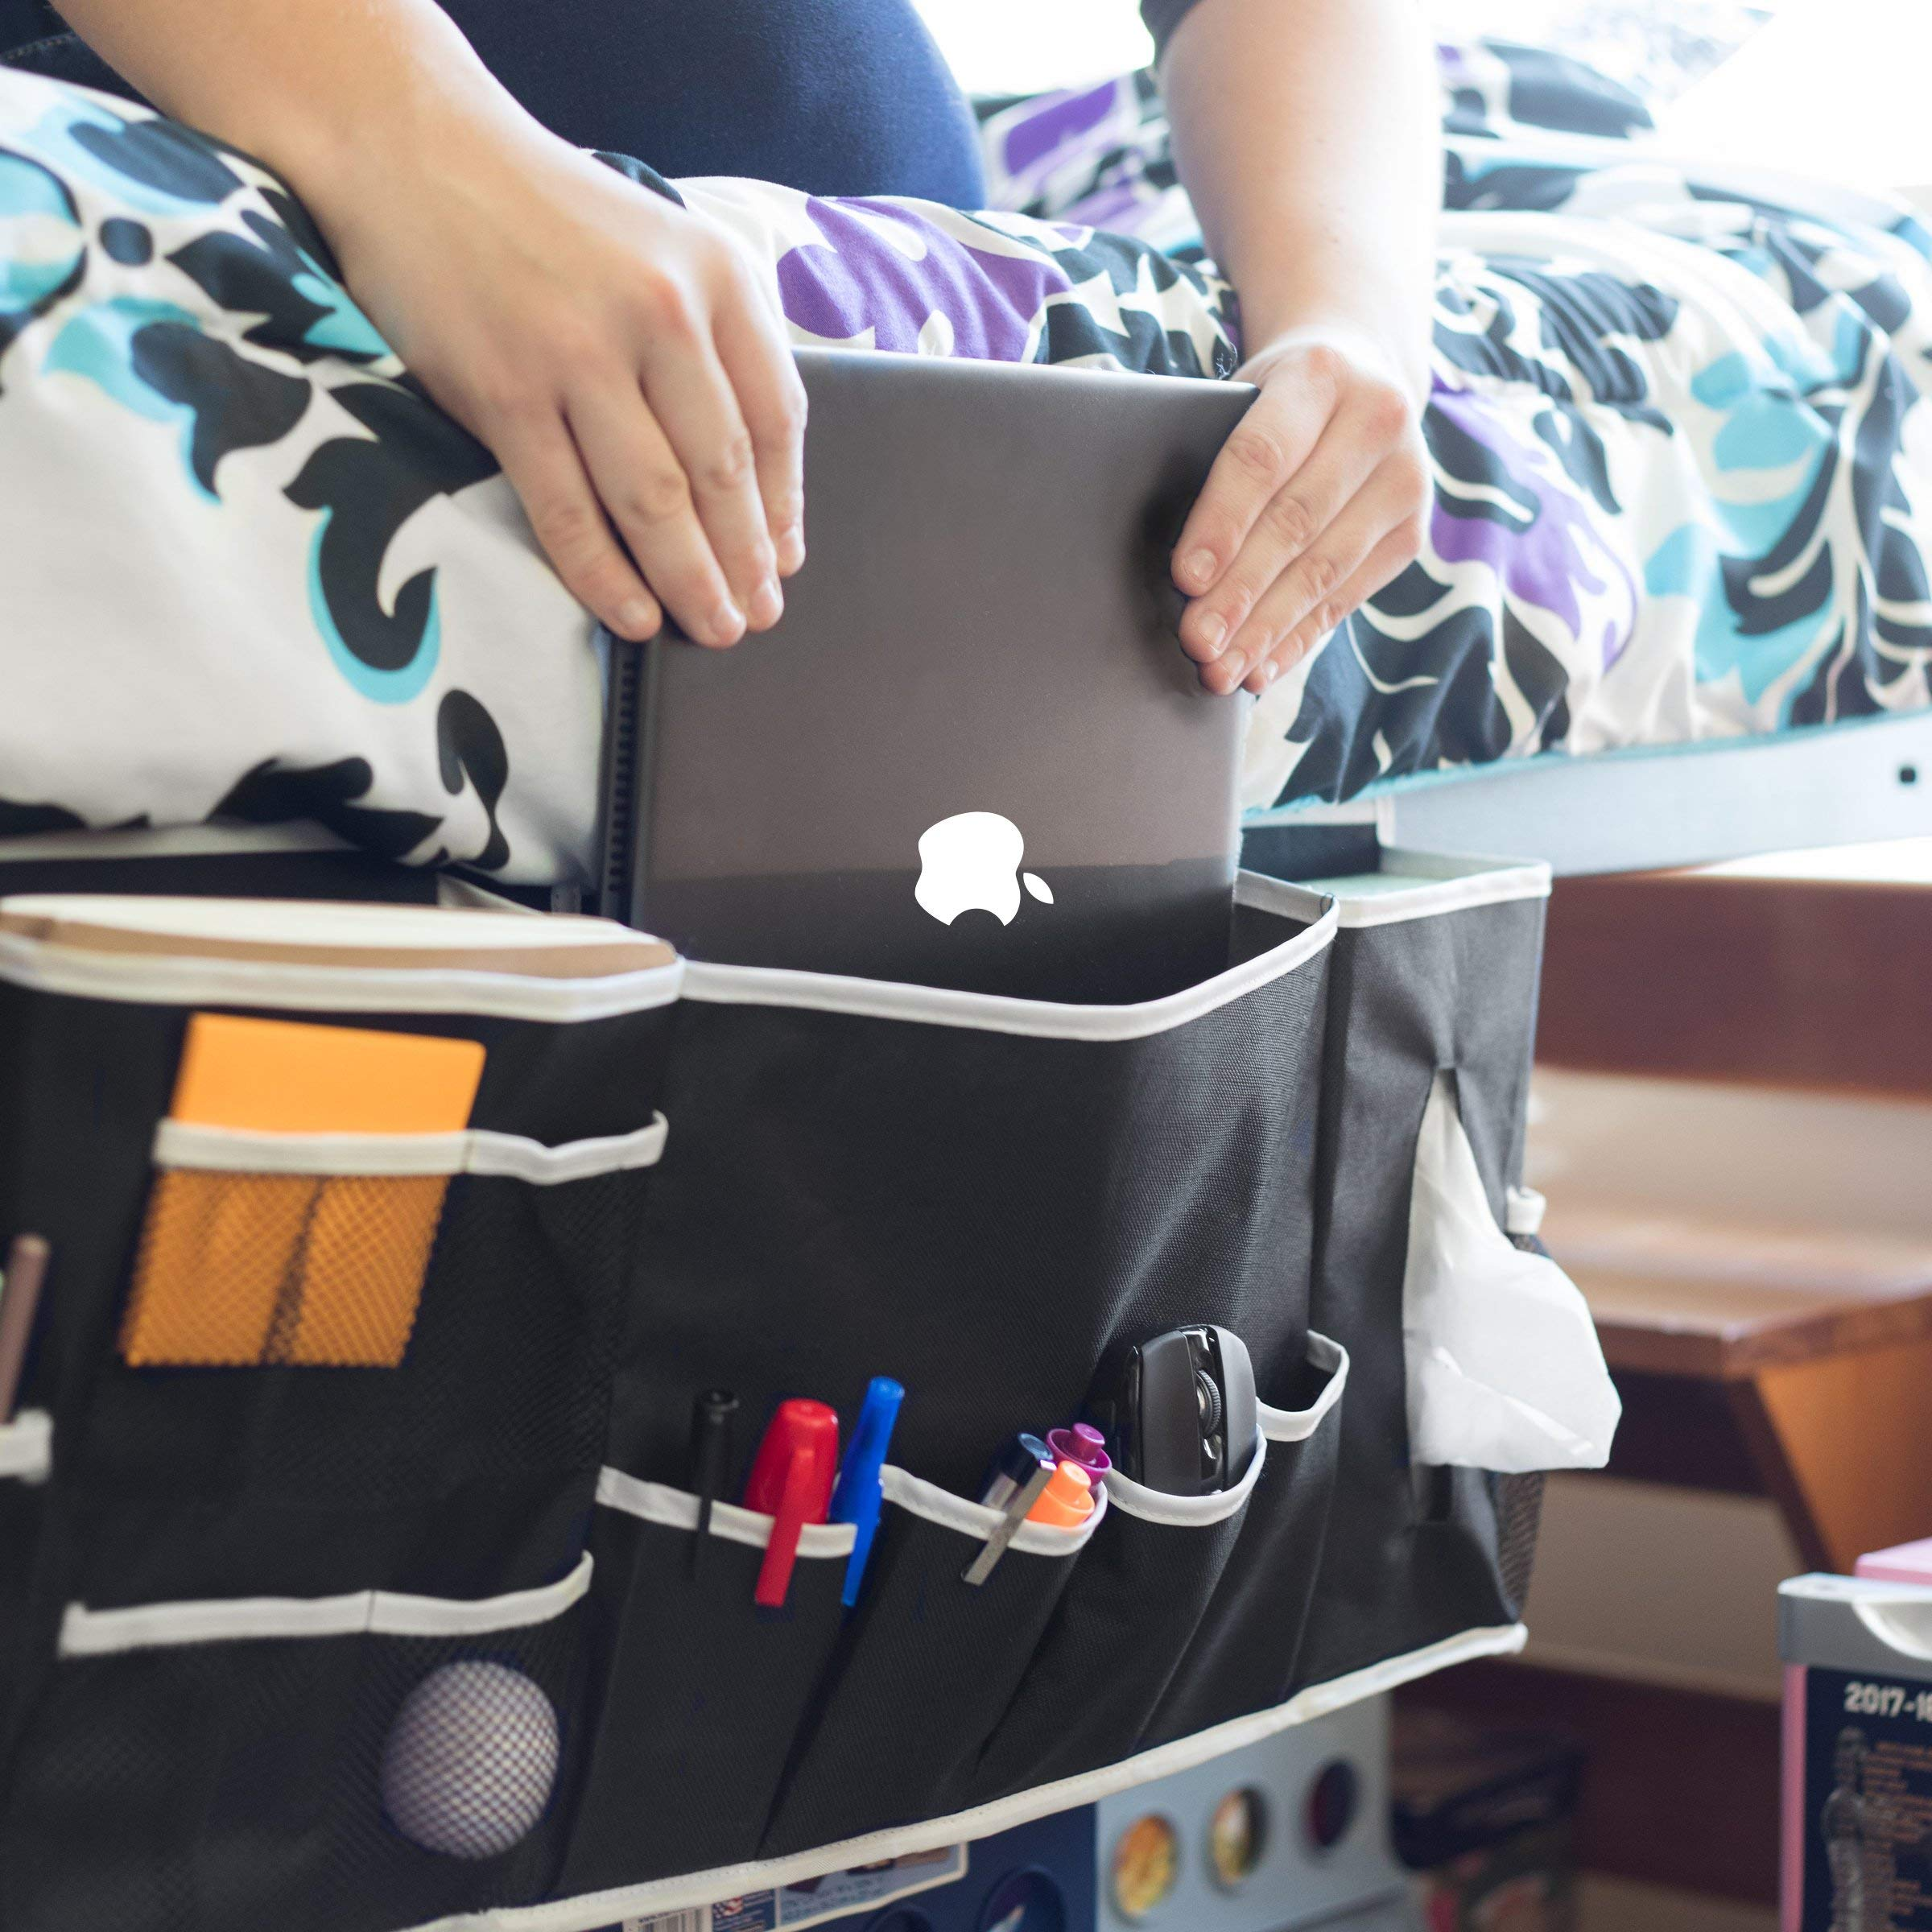 Kozy Designs Dorm Room Essentials Bedside Caddy Organizer